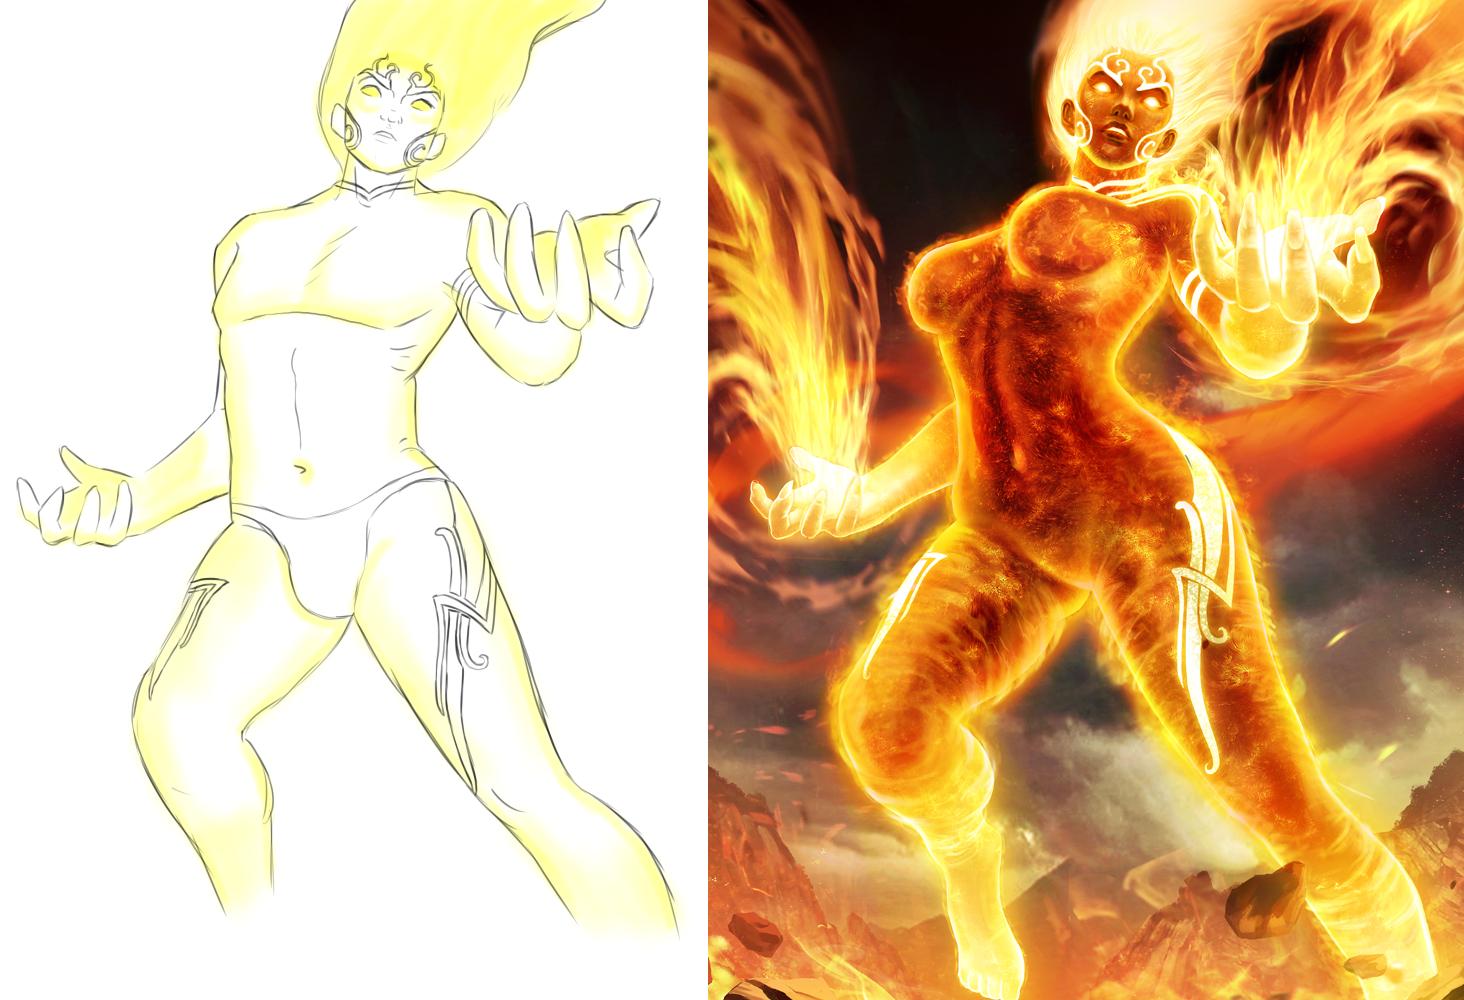 Human torch naked